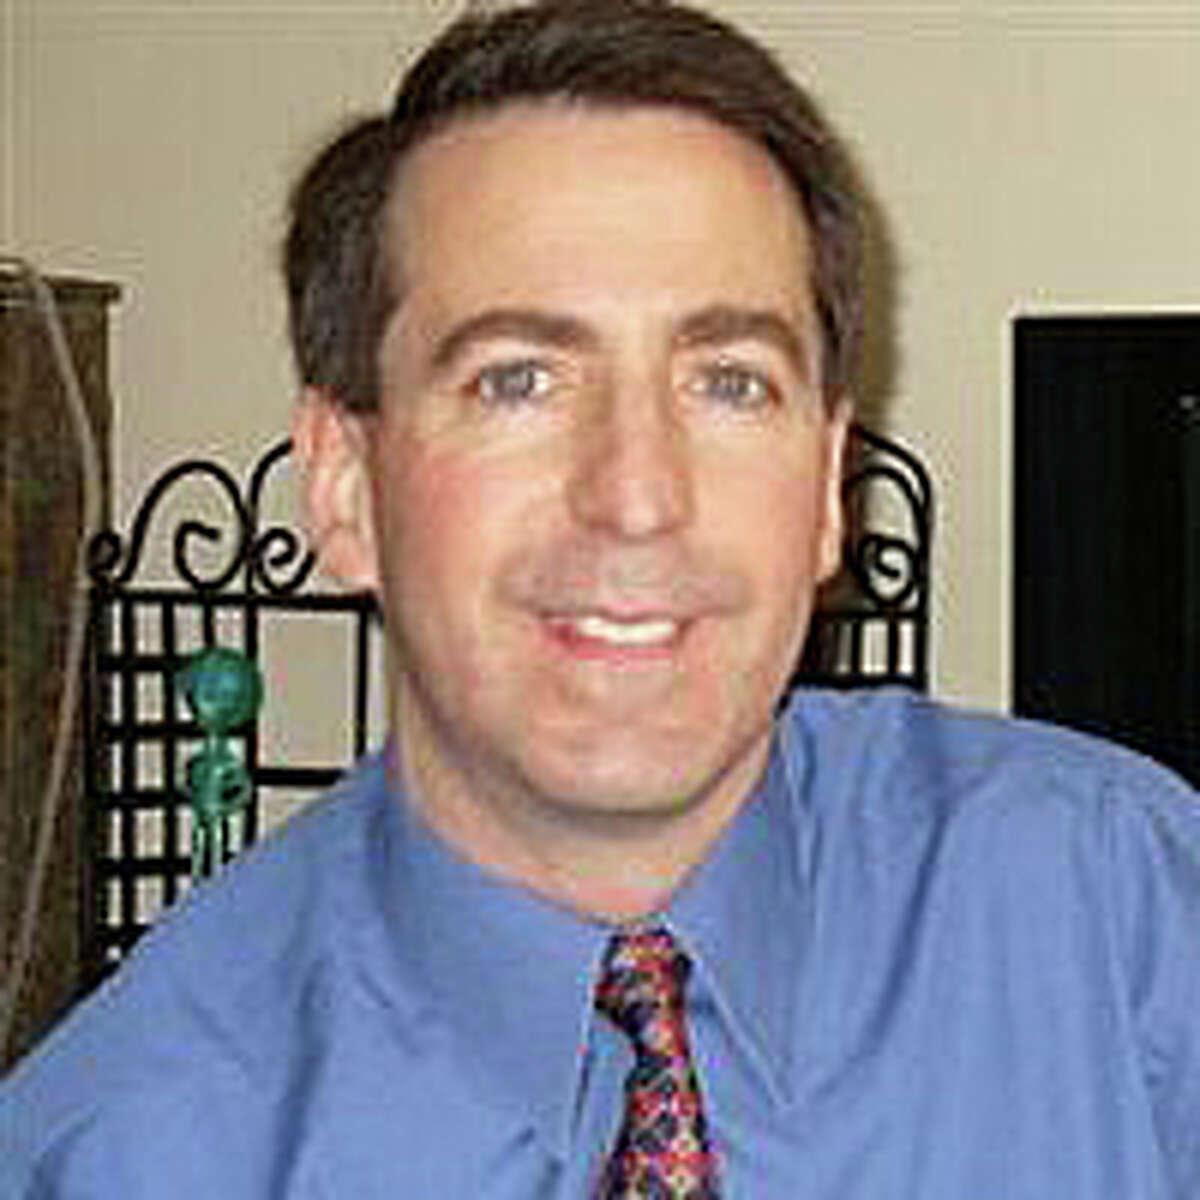 LinkedIn profile photo of Peter Lanza, father of Sandy Hook School gunman Adam Lanza.